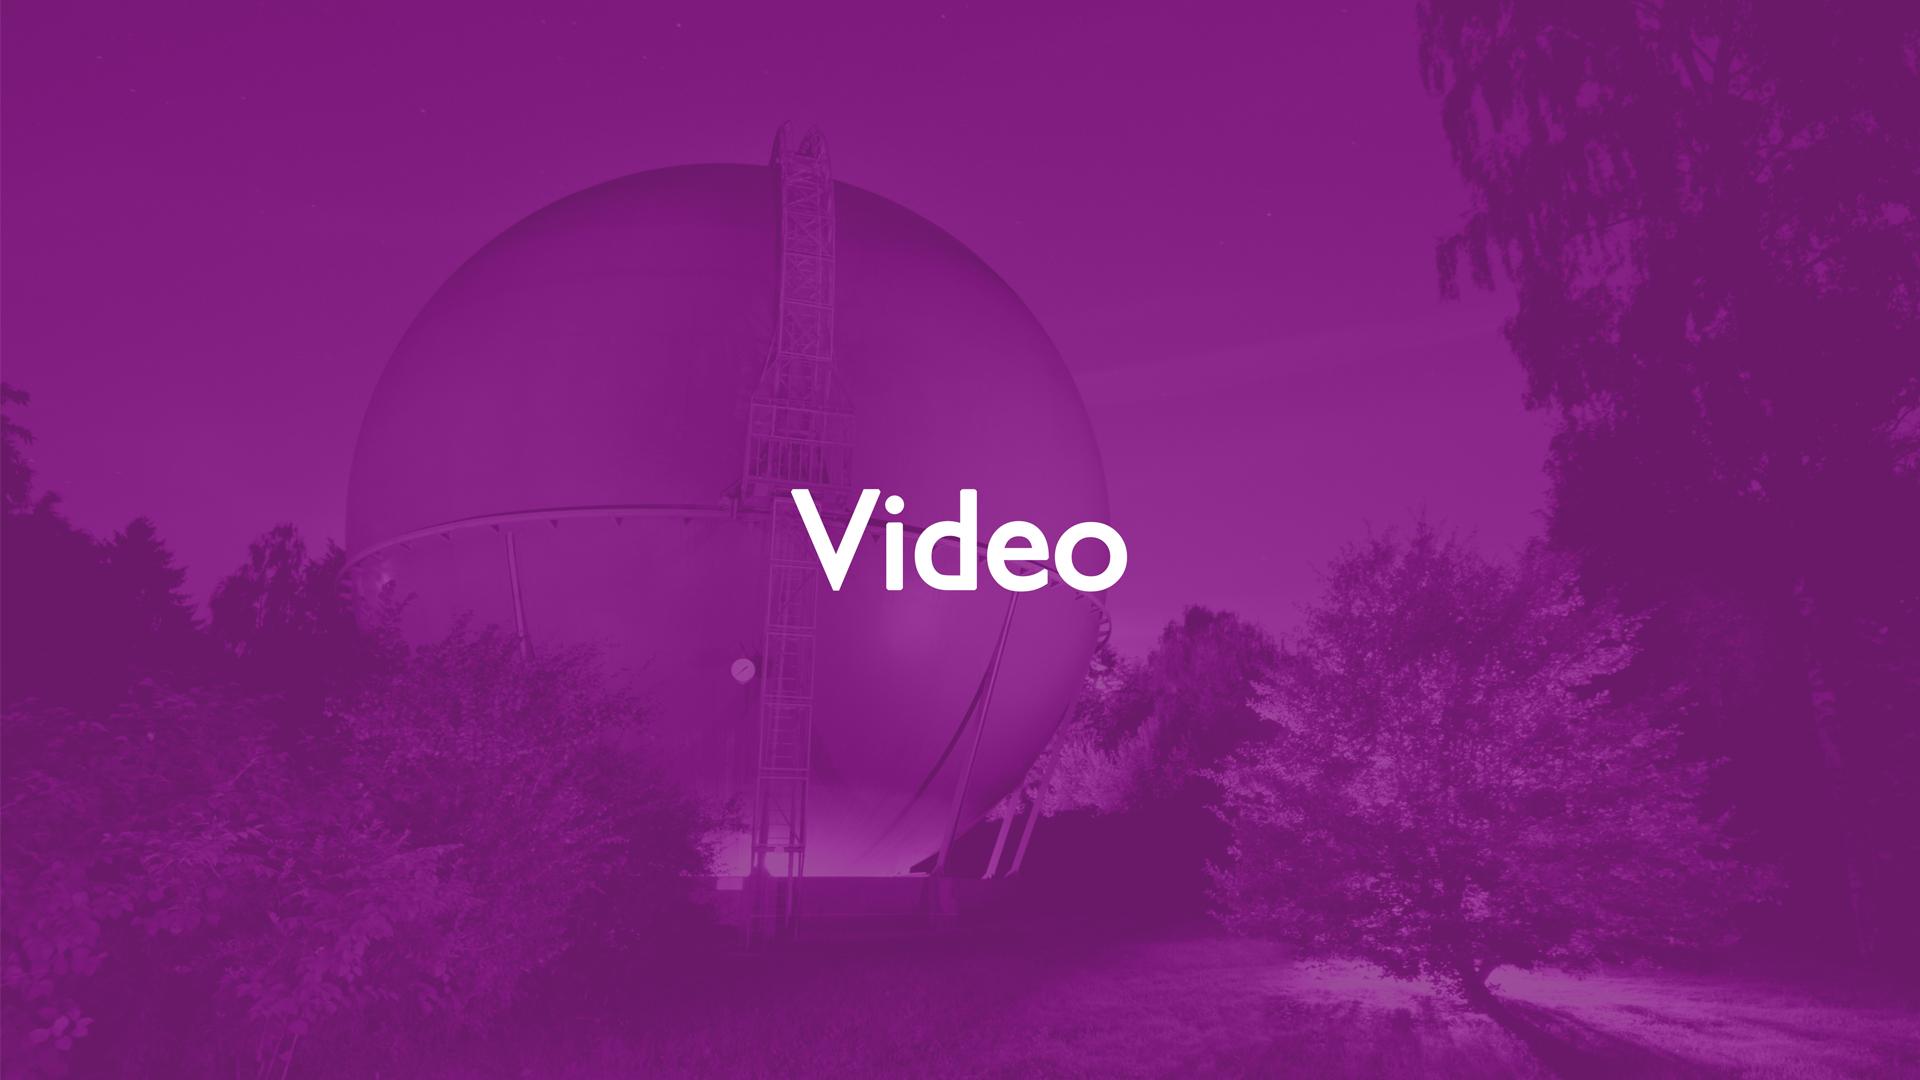 Video Splashscreen Galileum Solingen